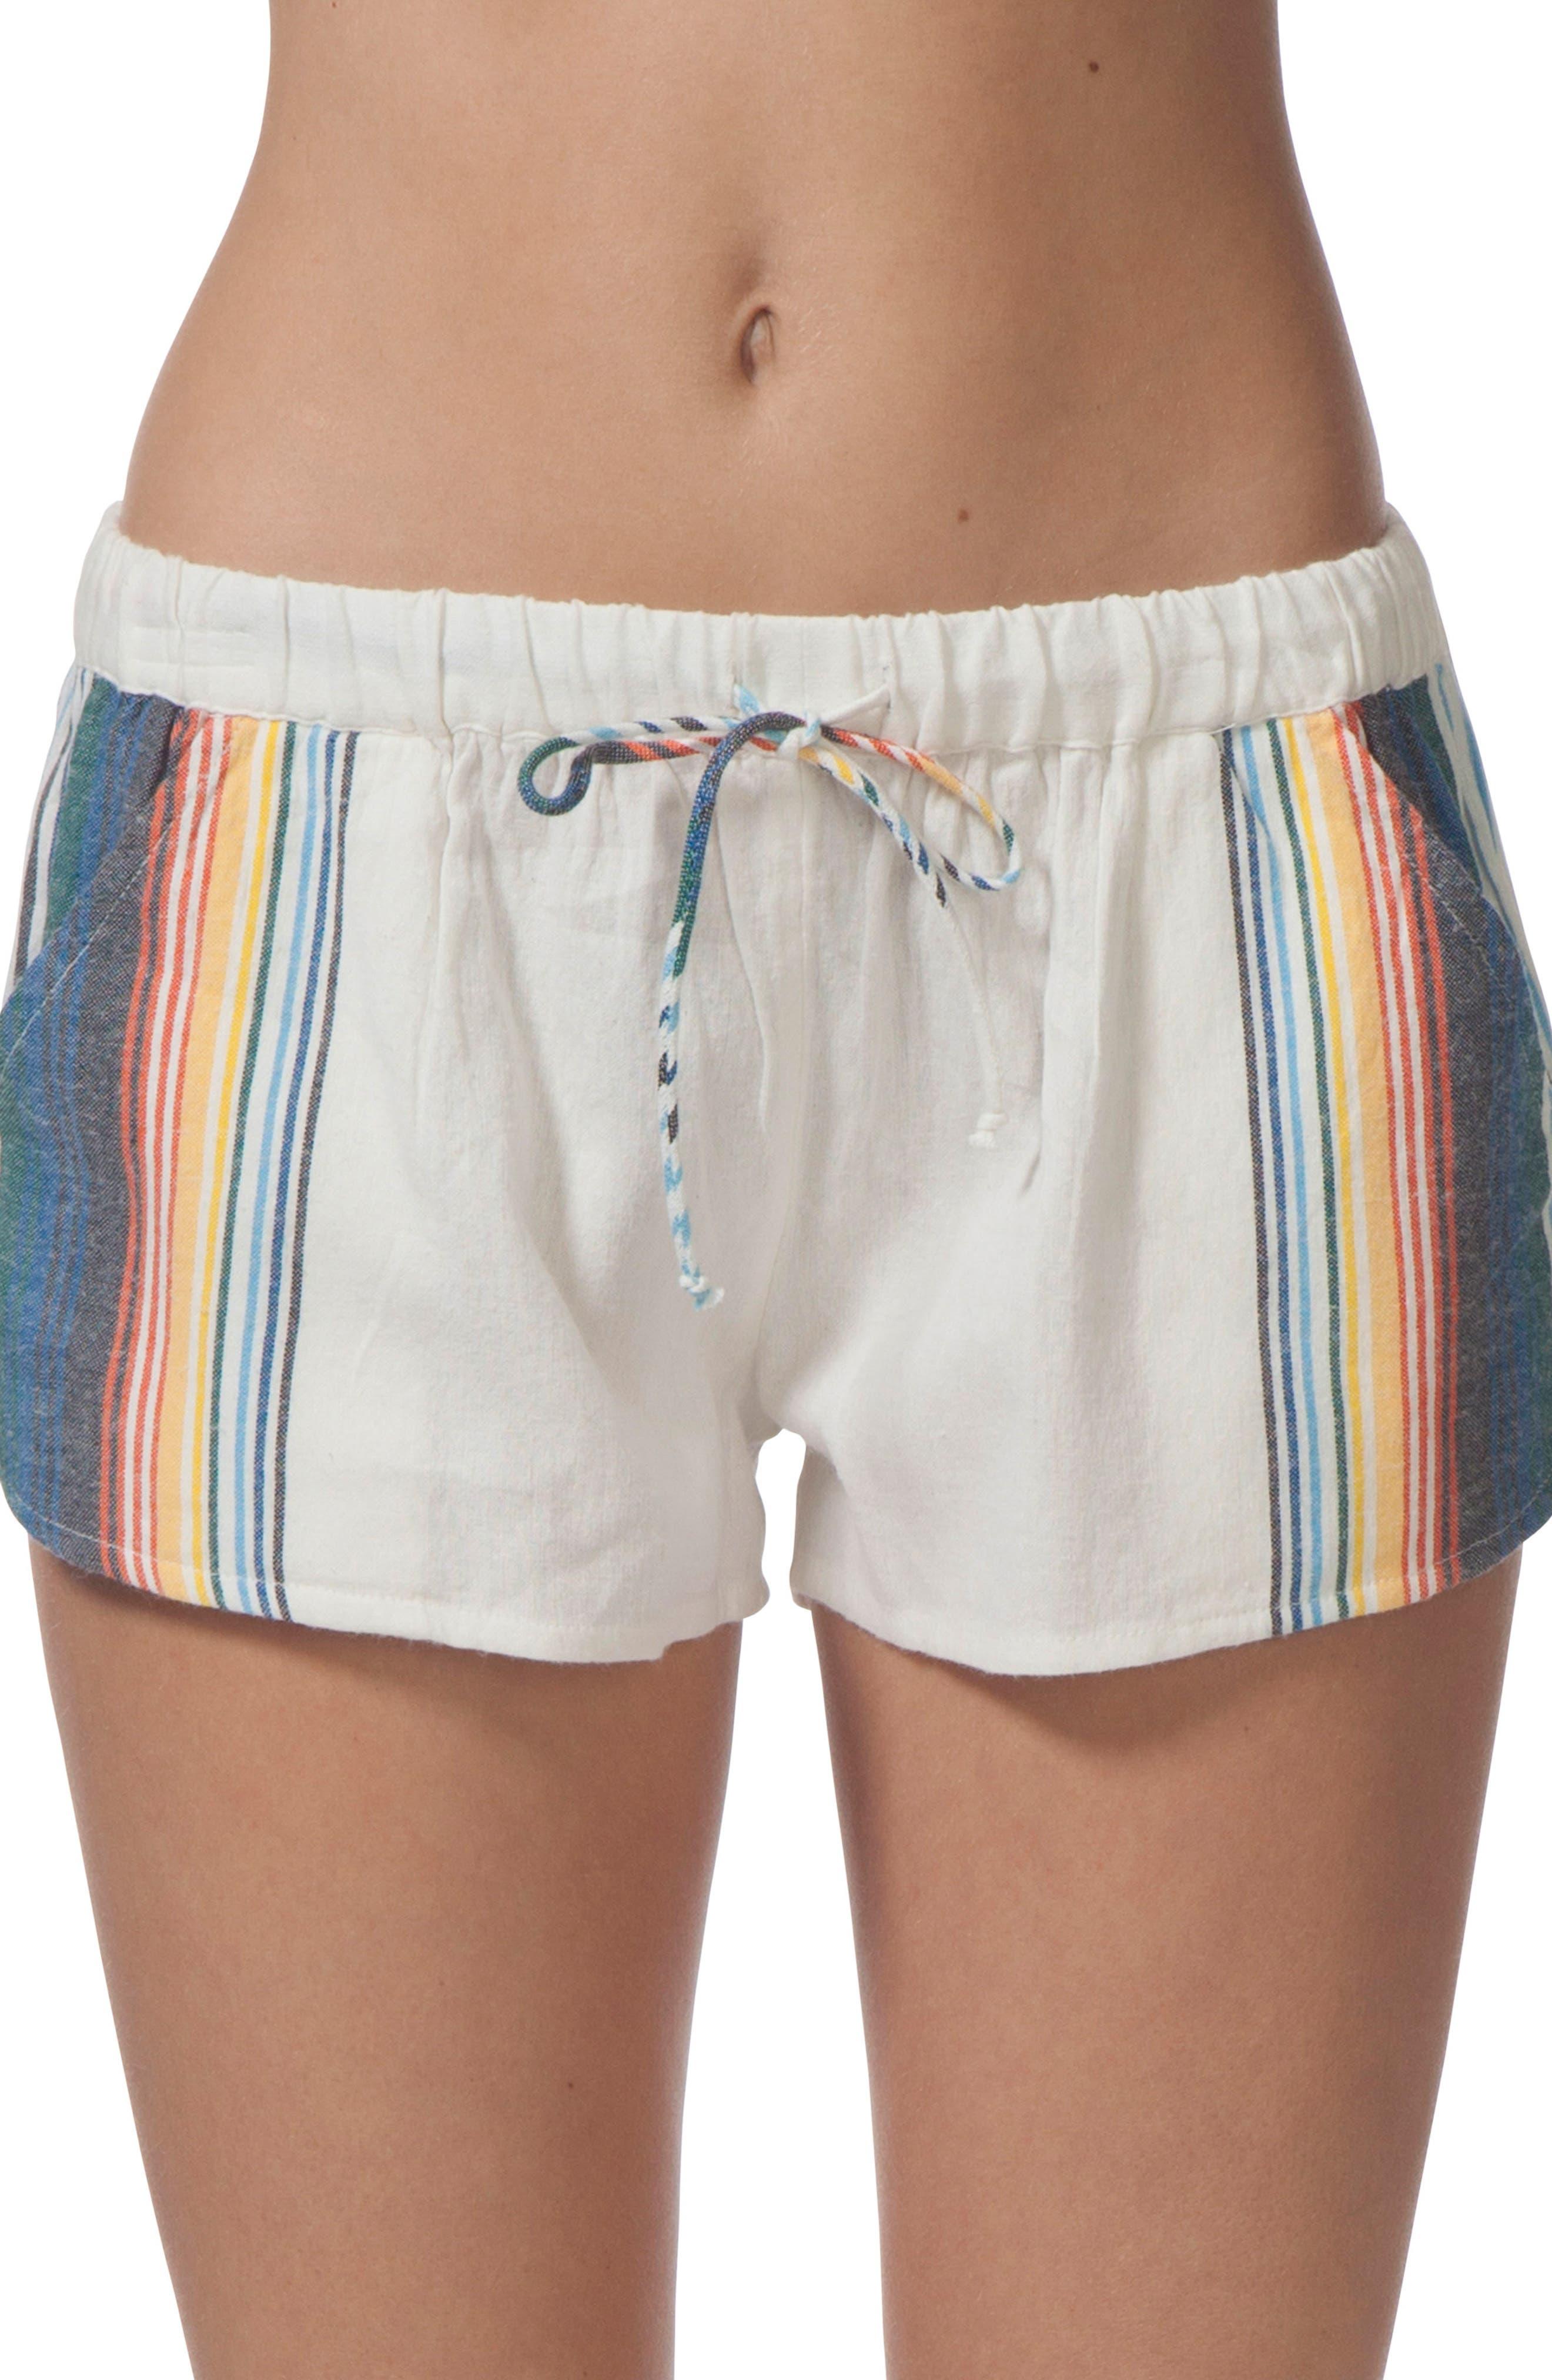 Beach Bazaar Cotton Shorts,                             Main thumbnail 1, color,                             Vanilla